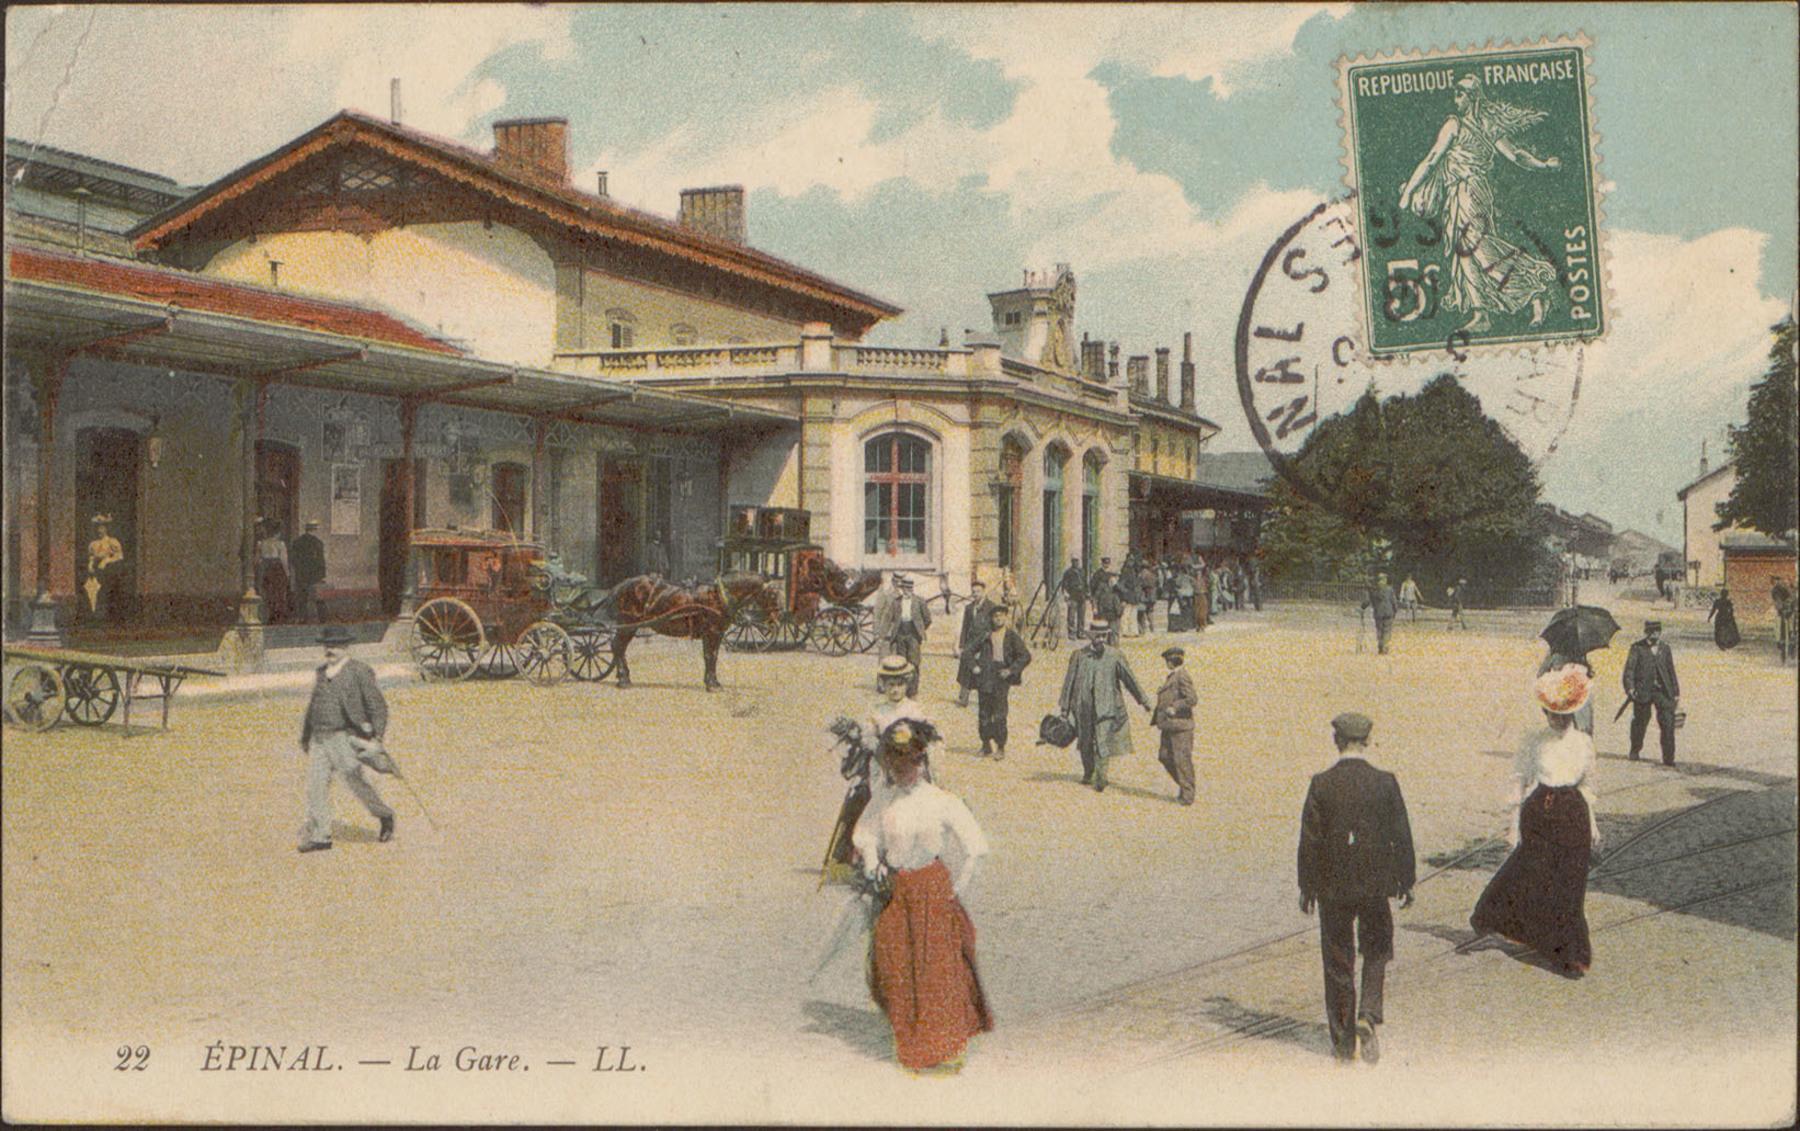 Contenu du Épinal, La Gare